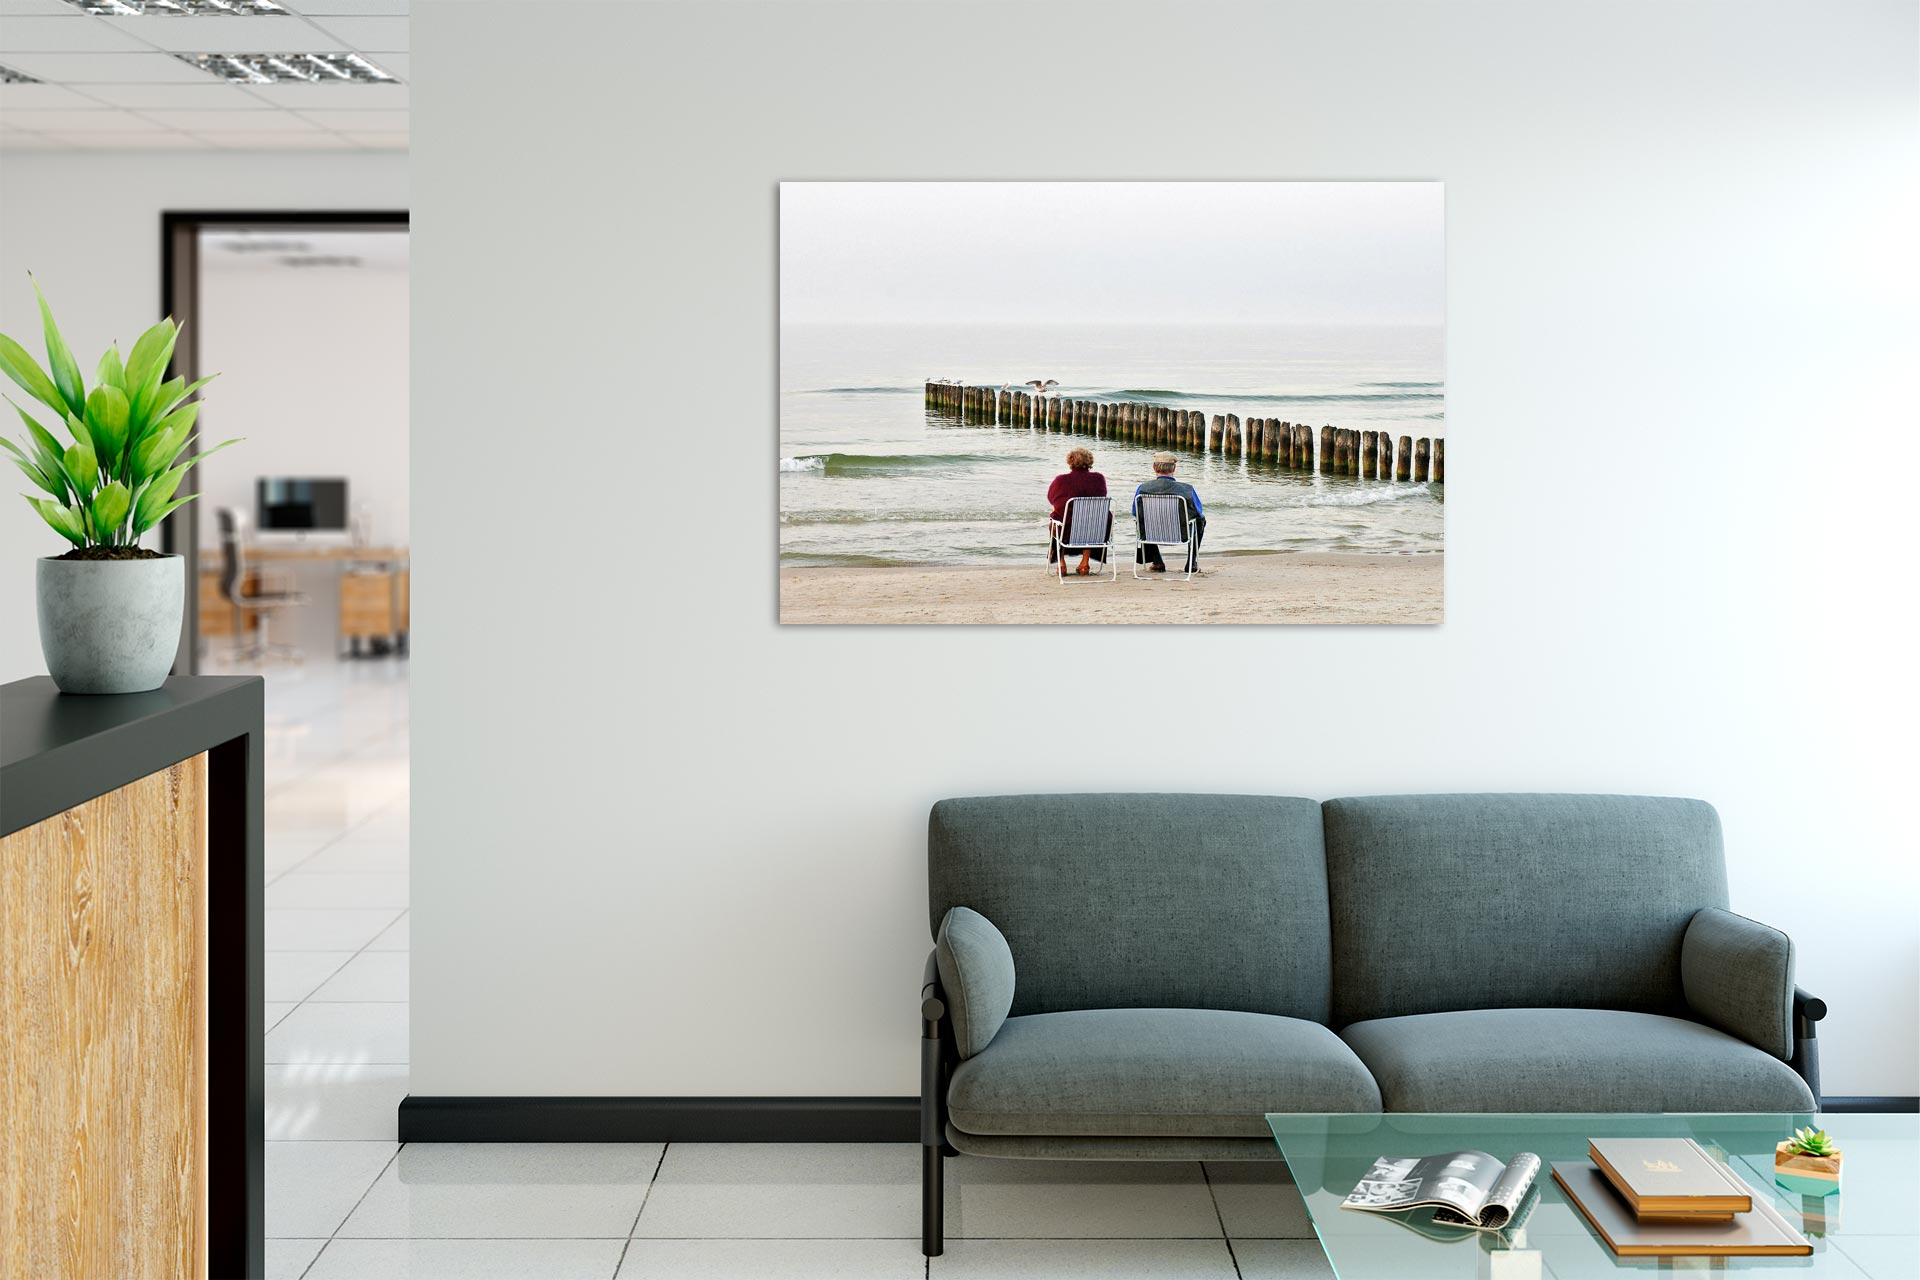 LCW041-alte-liebe-wandbild-bild-auf-leinwand-acrylglas-aludibond-empfang